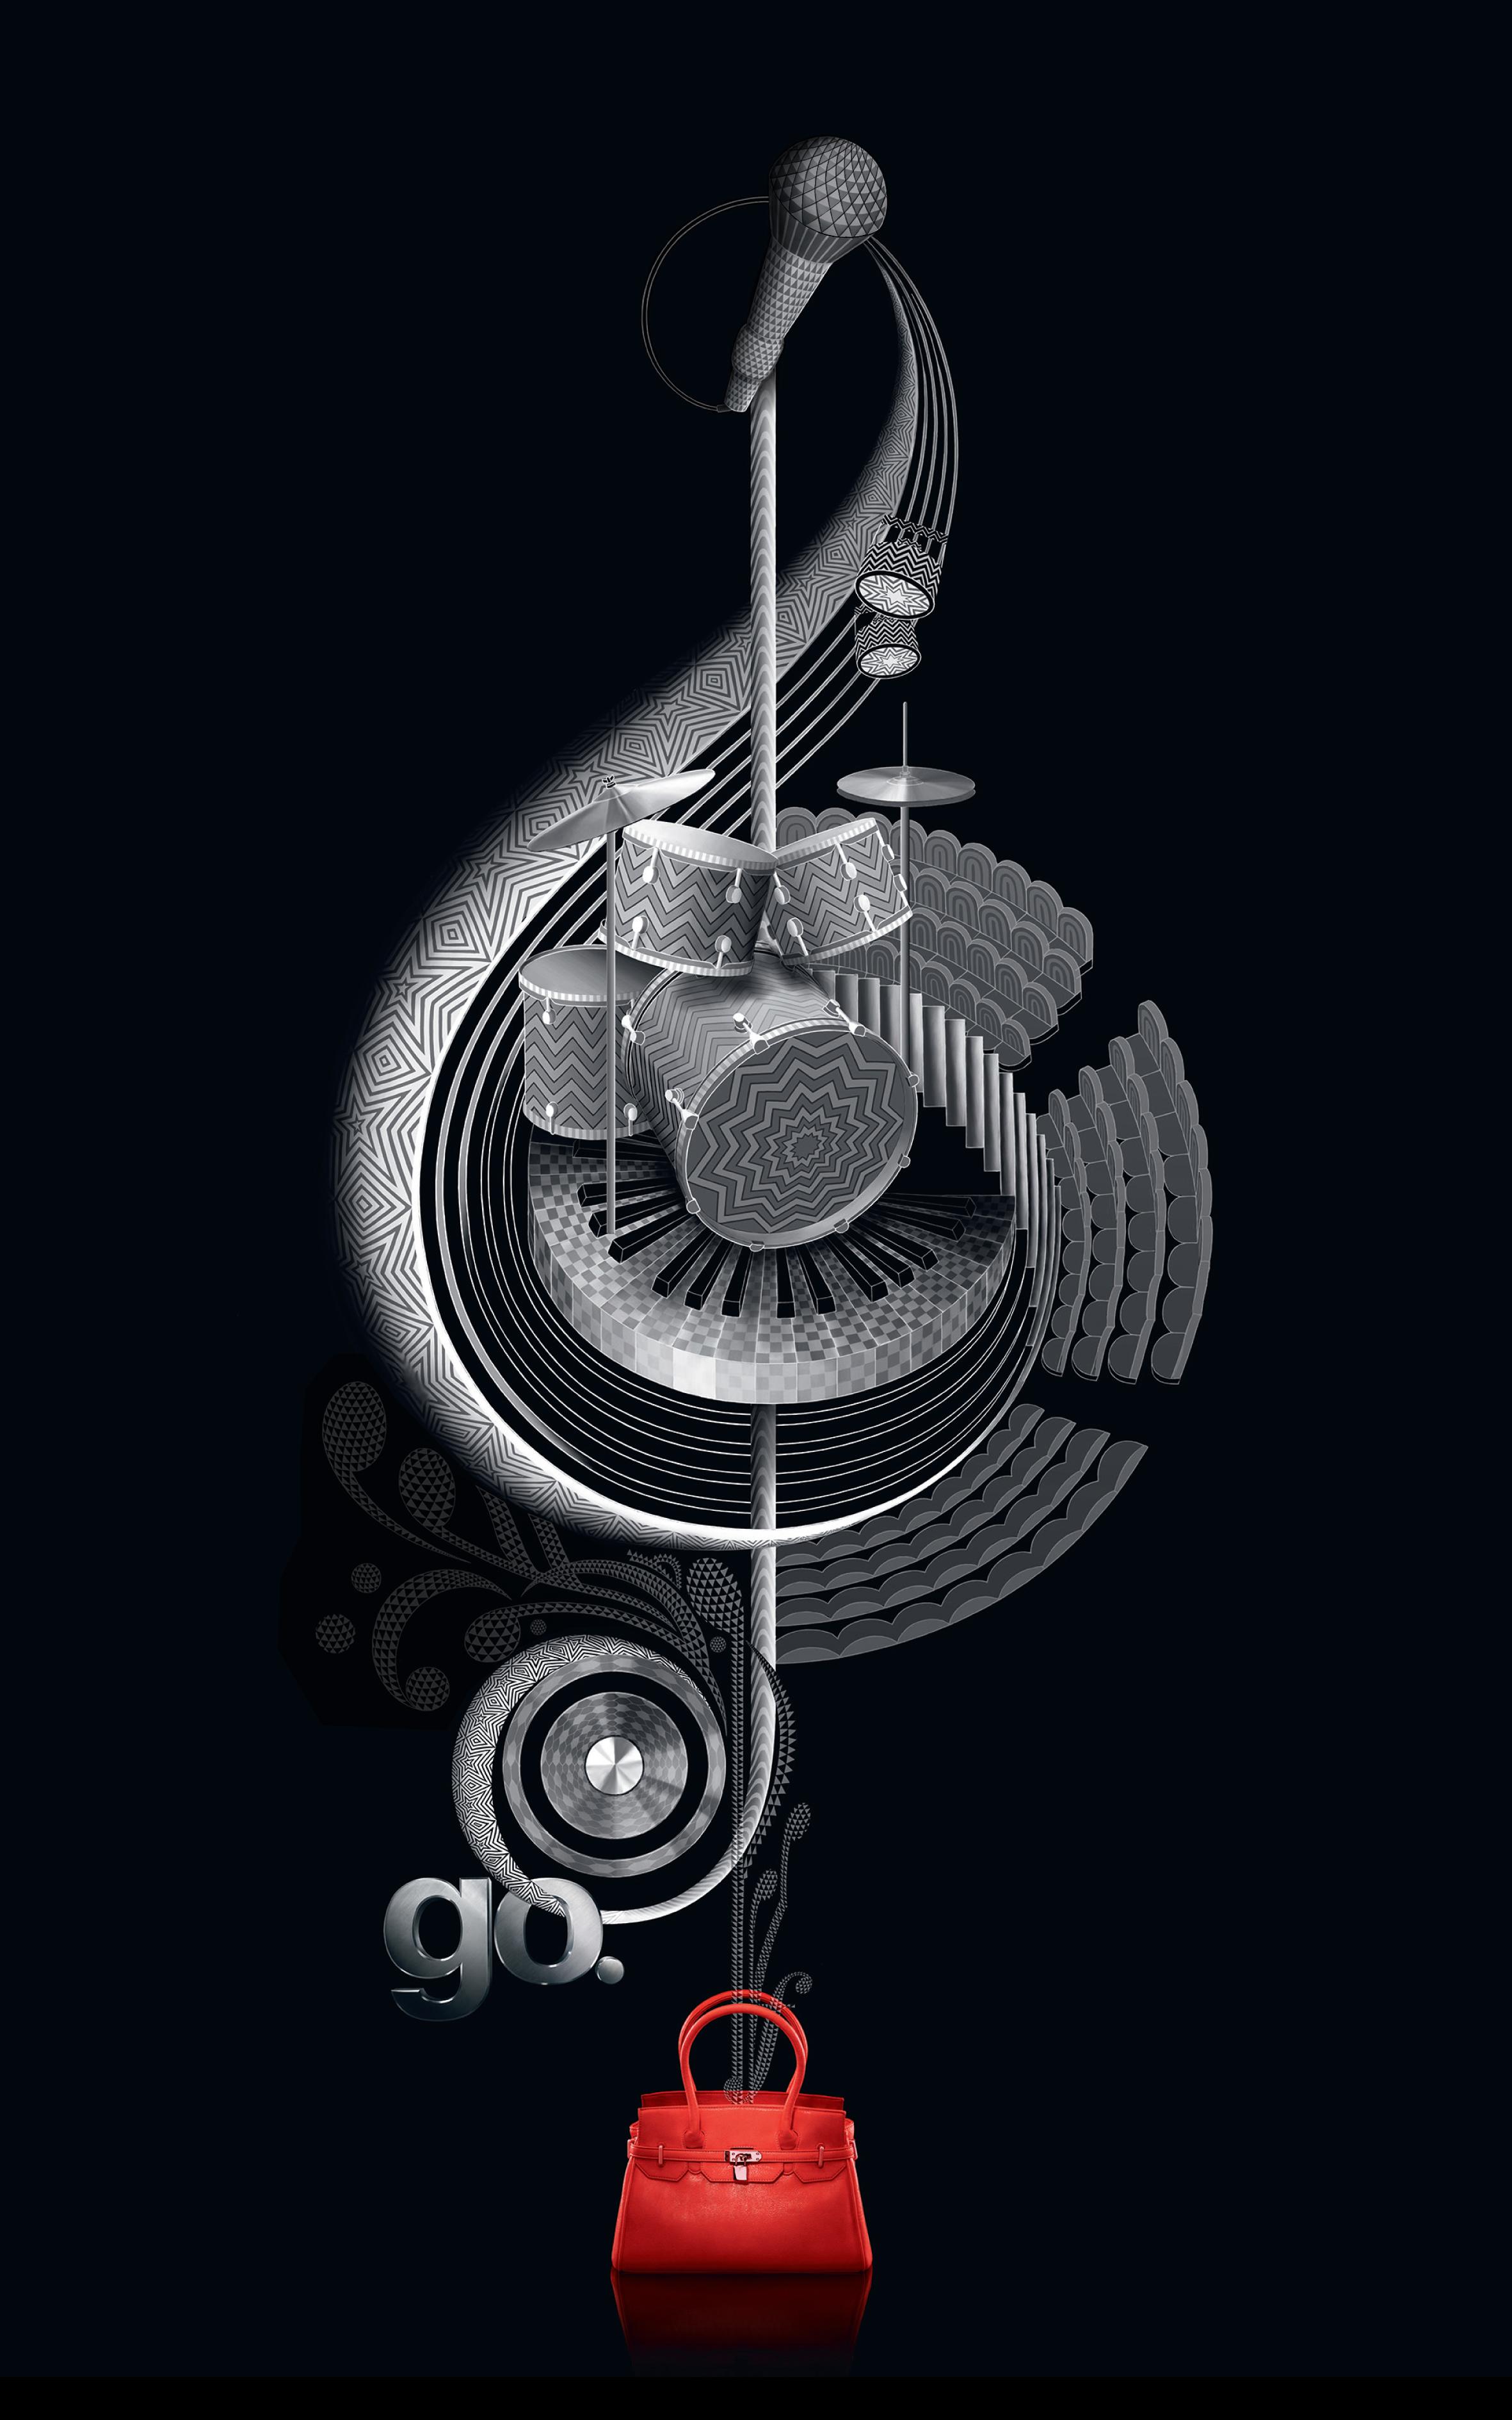 YEHRIN_TONG_VISA_MUSIC2.jpg